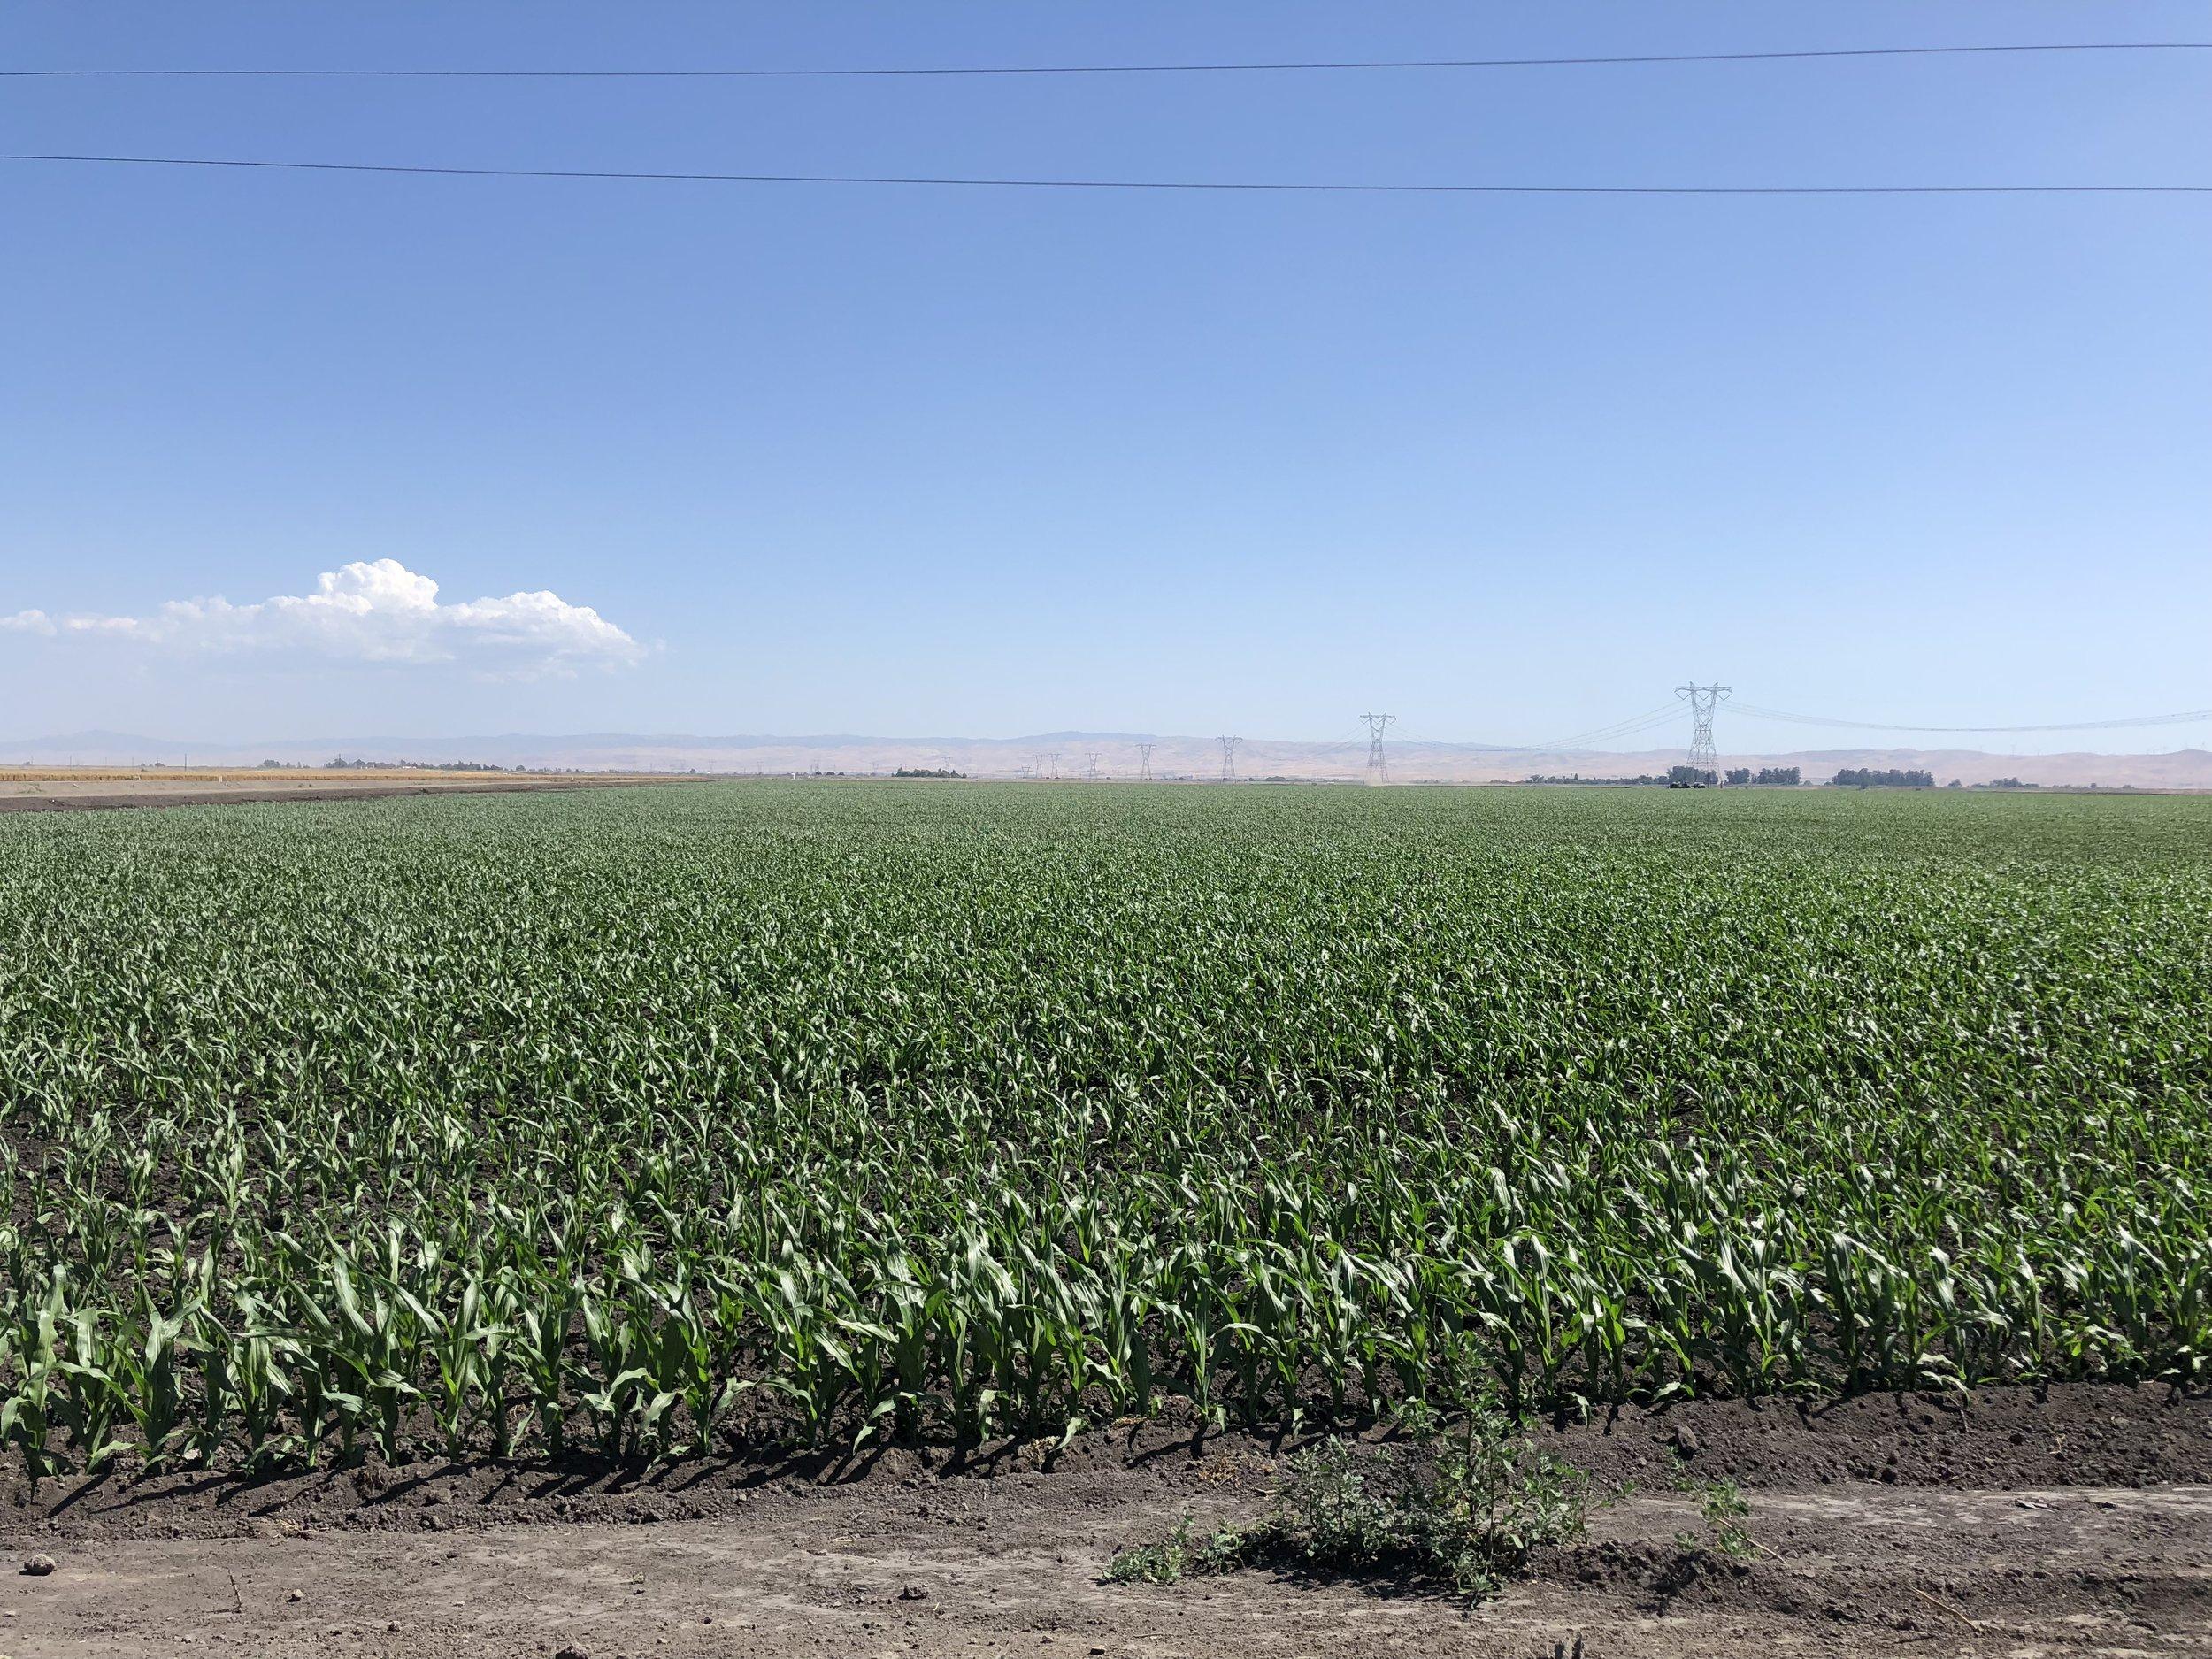 California Corn - If you plant it, it will grow